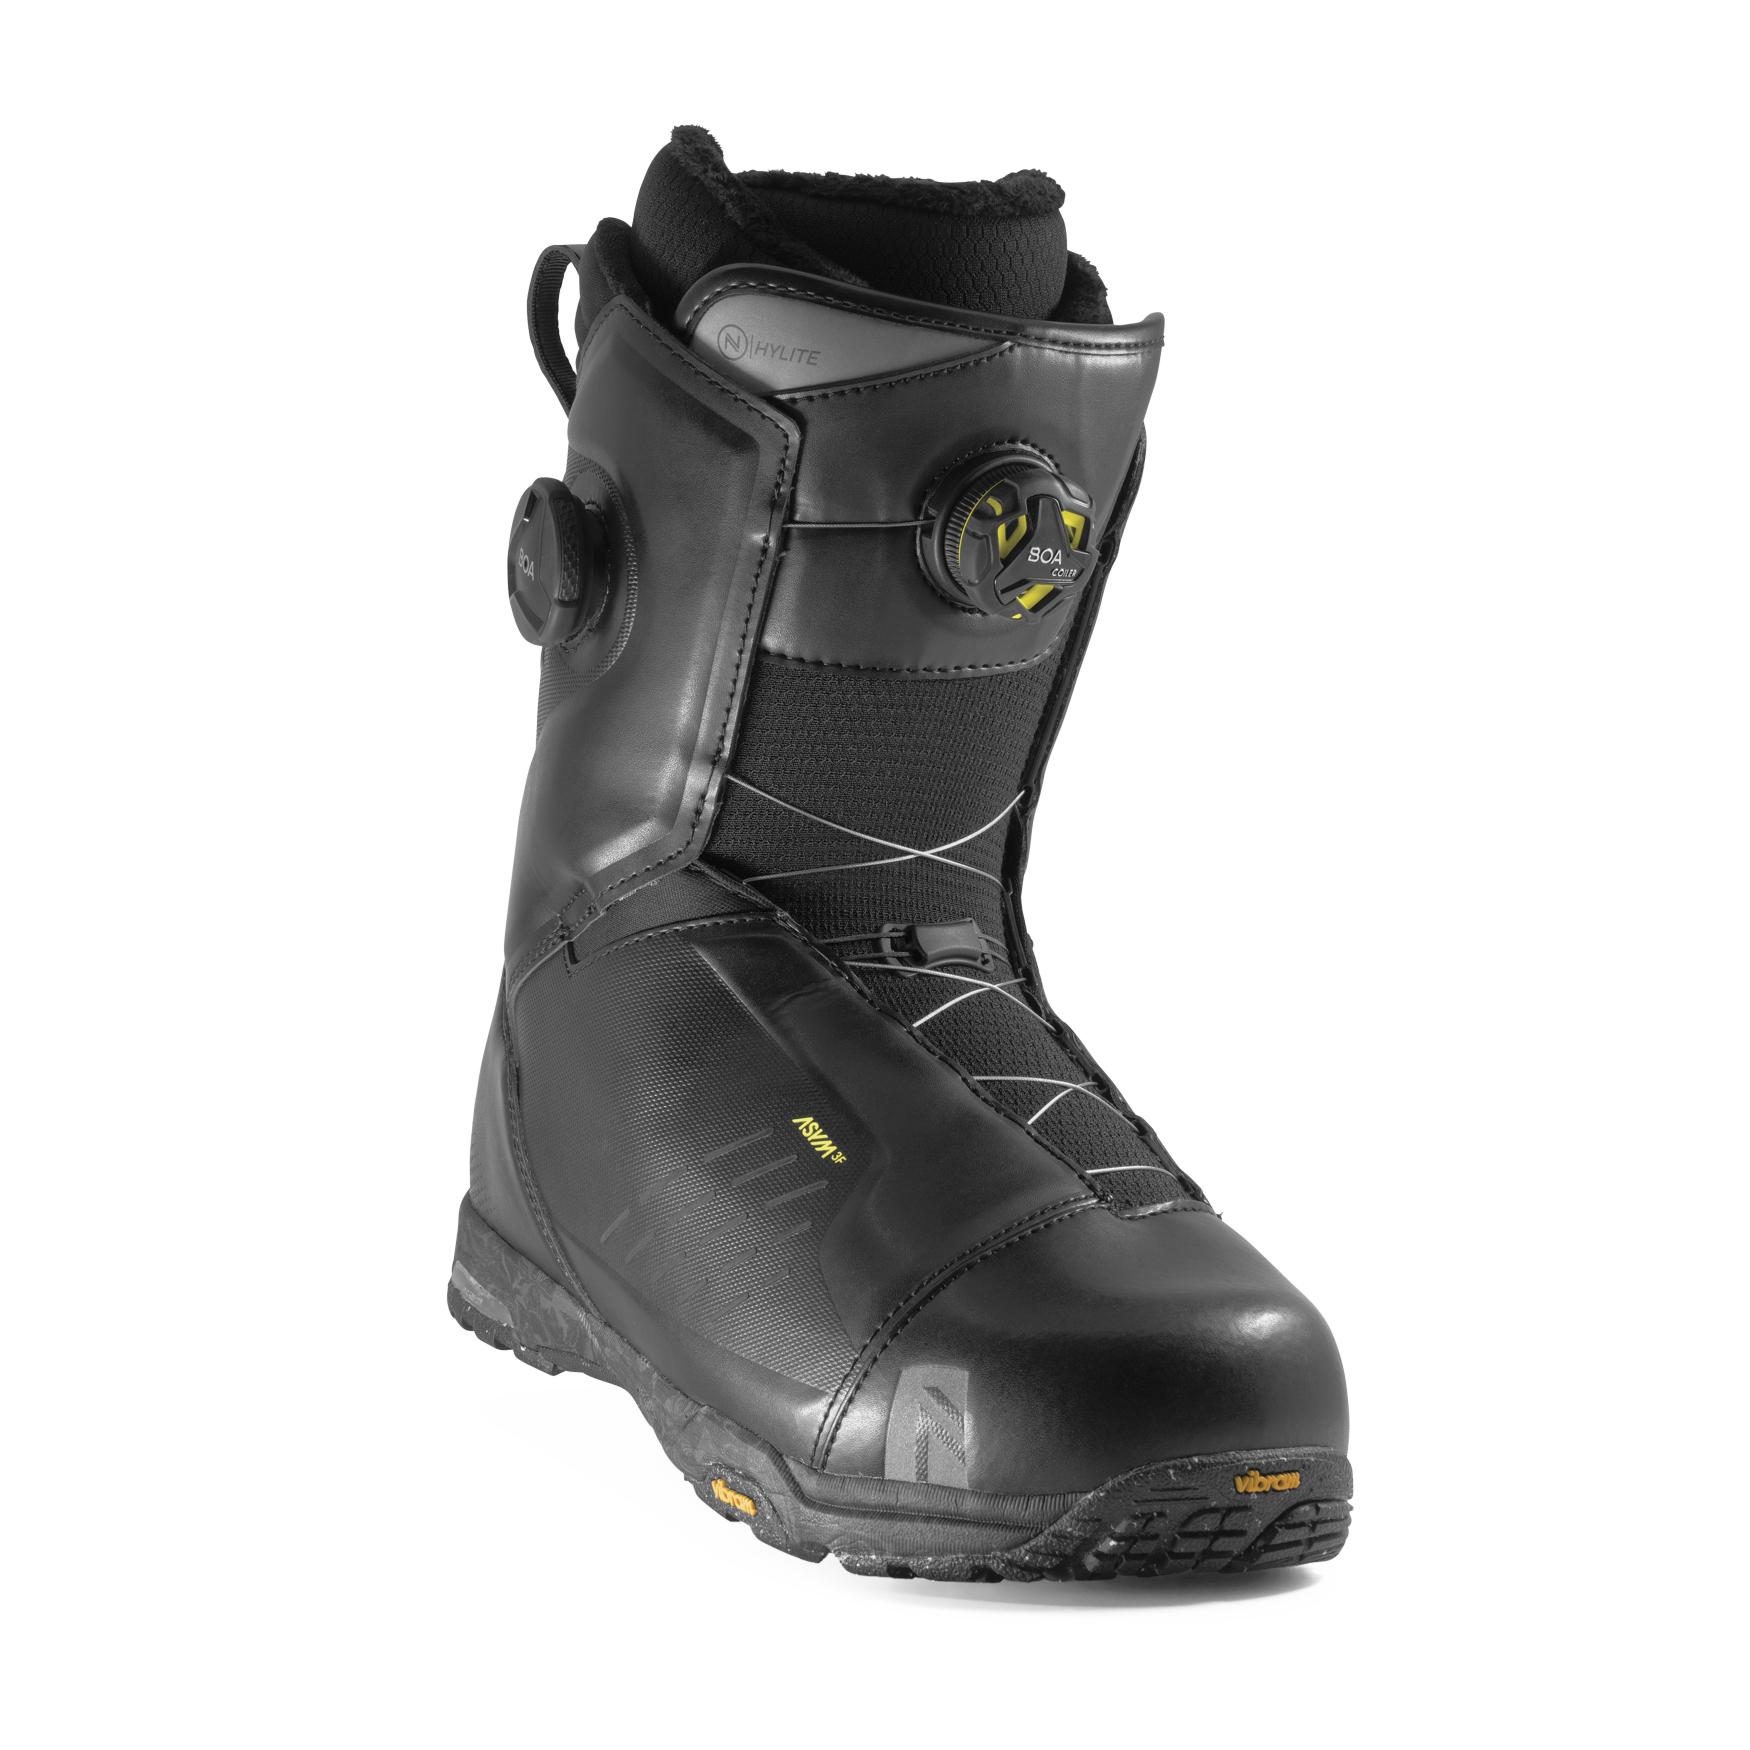 Boots snowboard barbati Nidecker Hylite Negru 2020 imagine